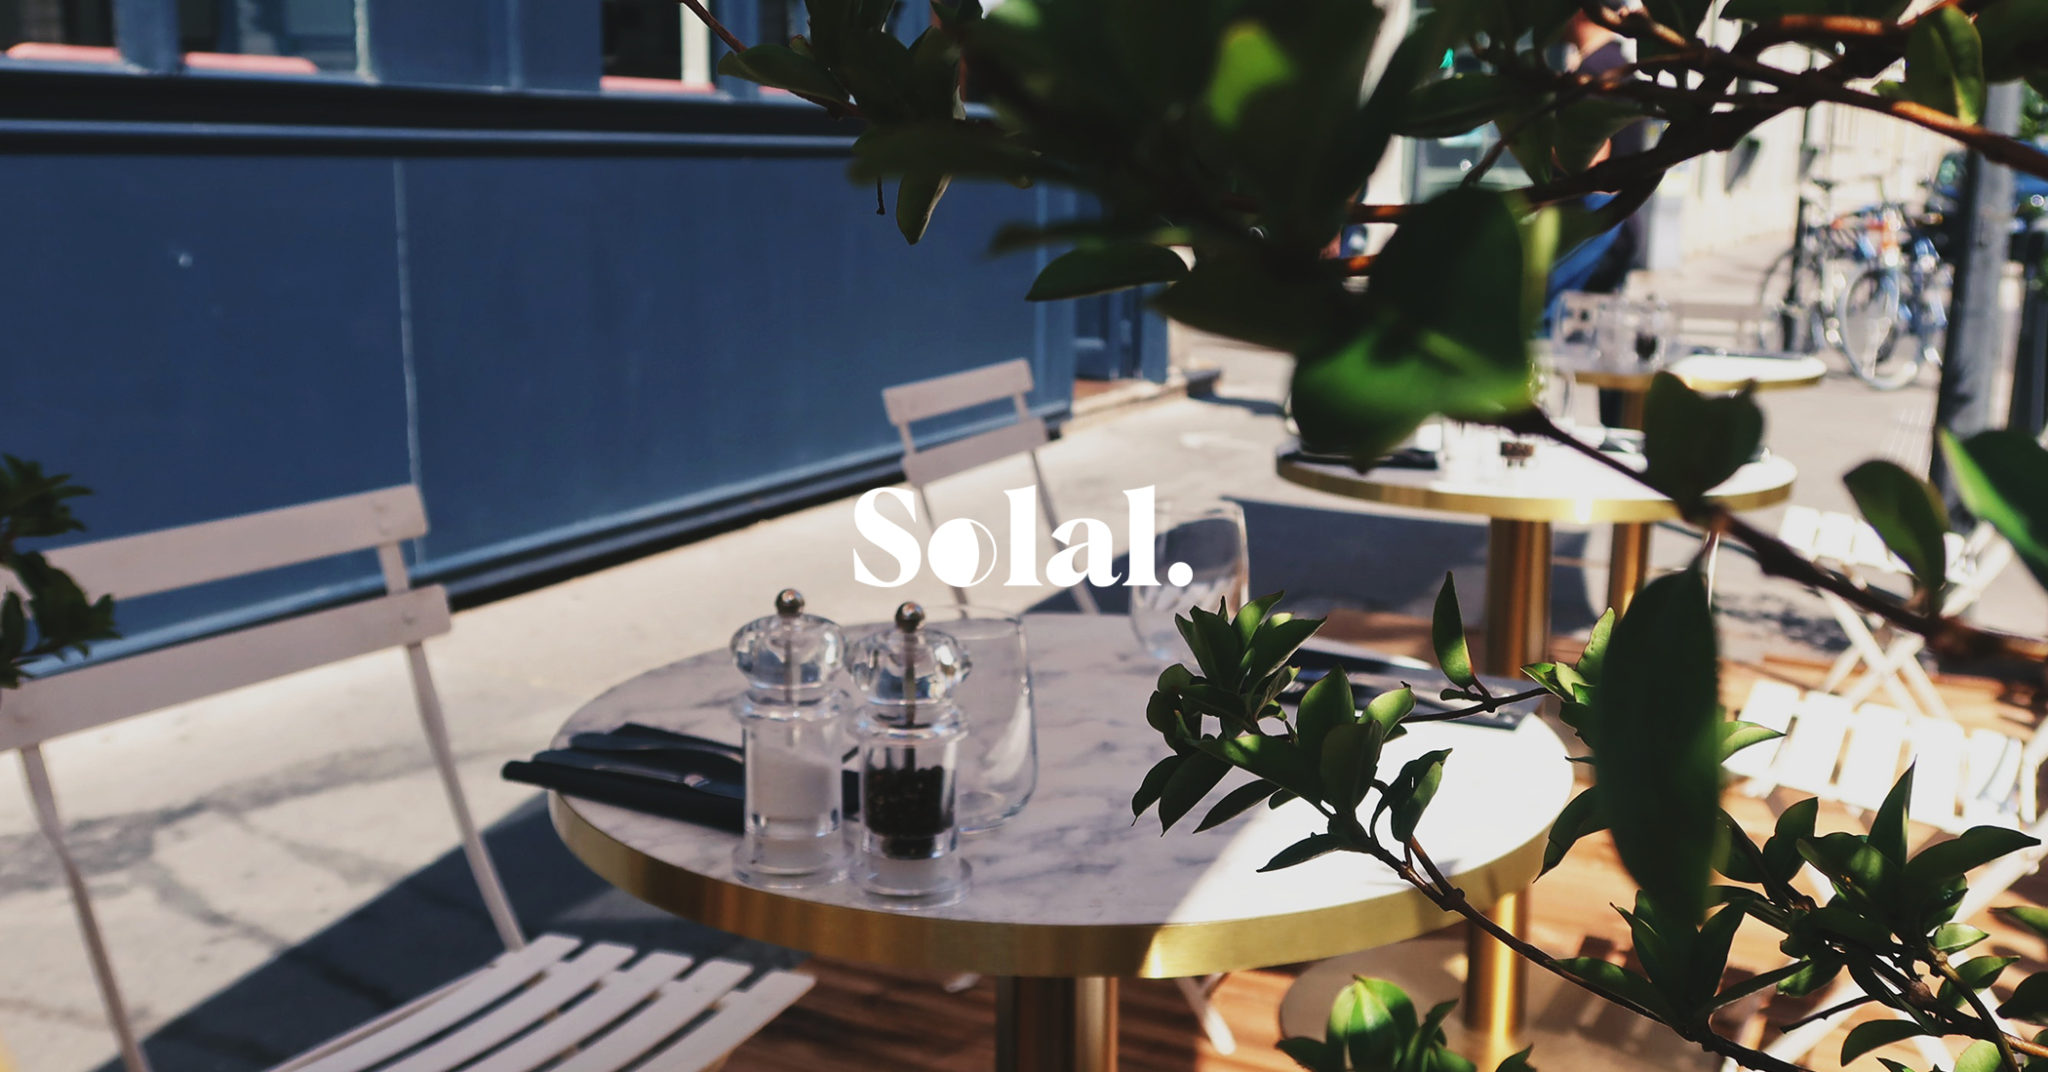 solal terrasse bar cocktails lyon